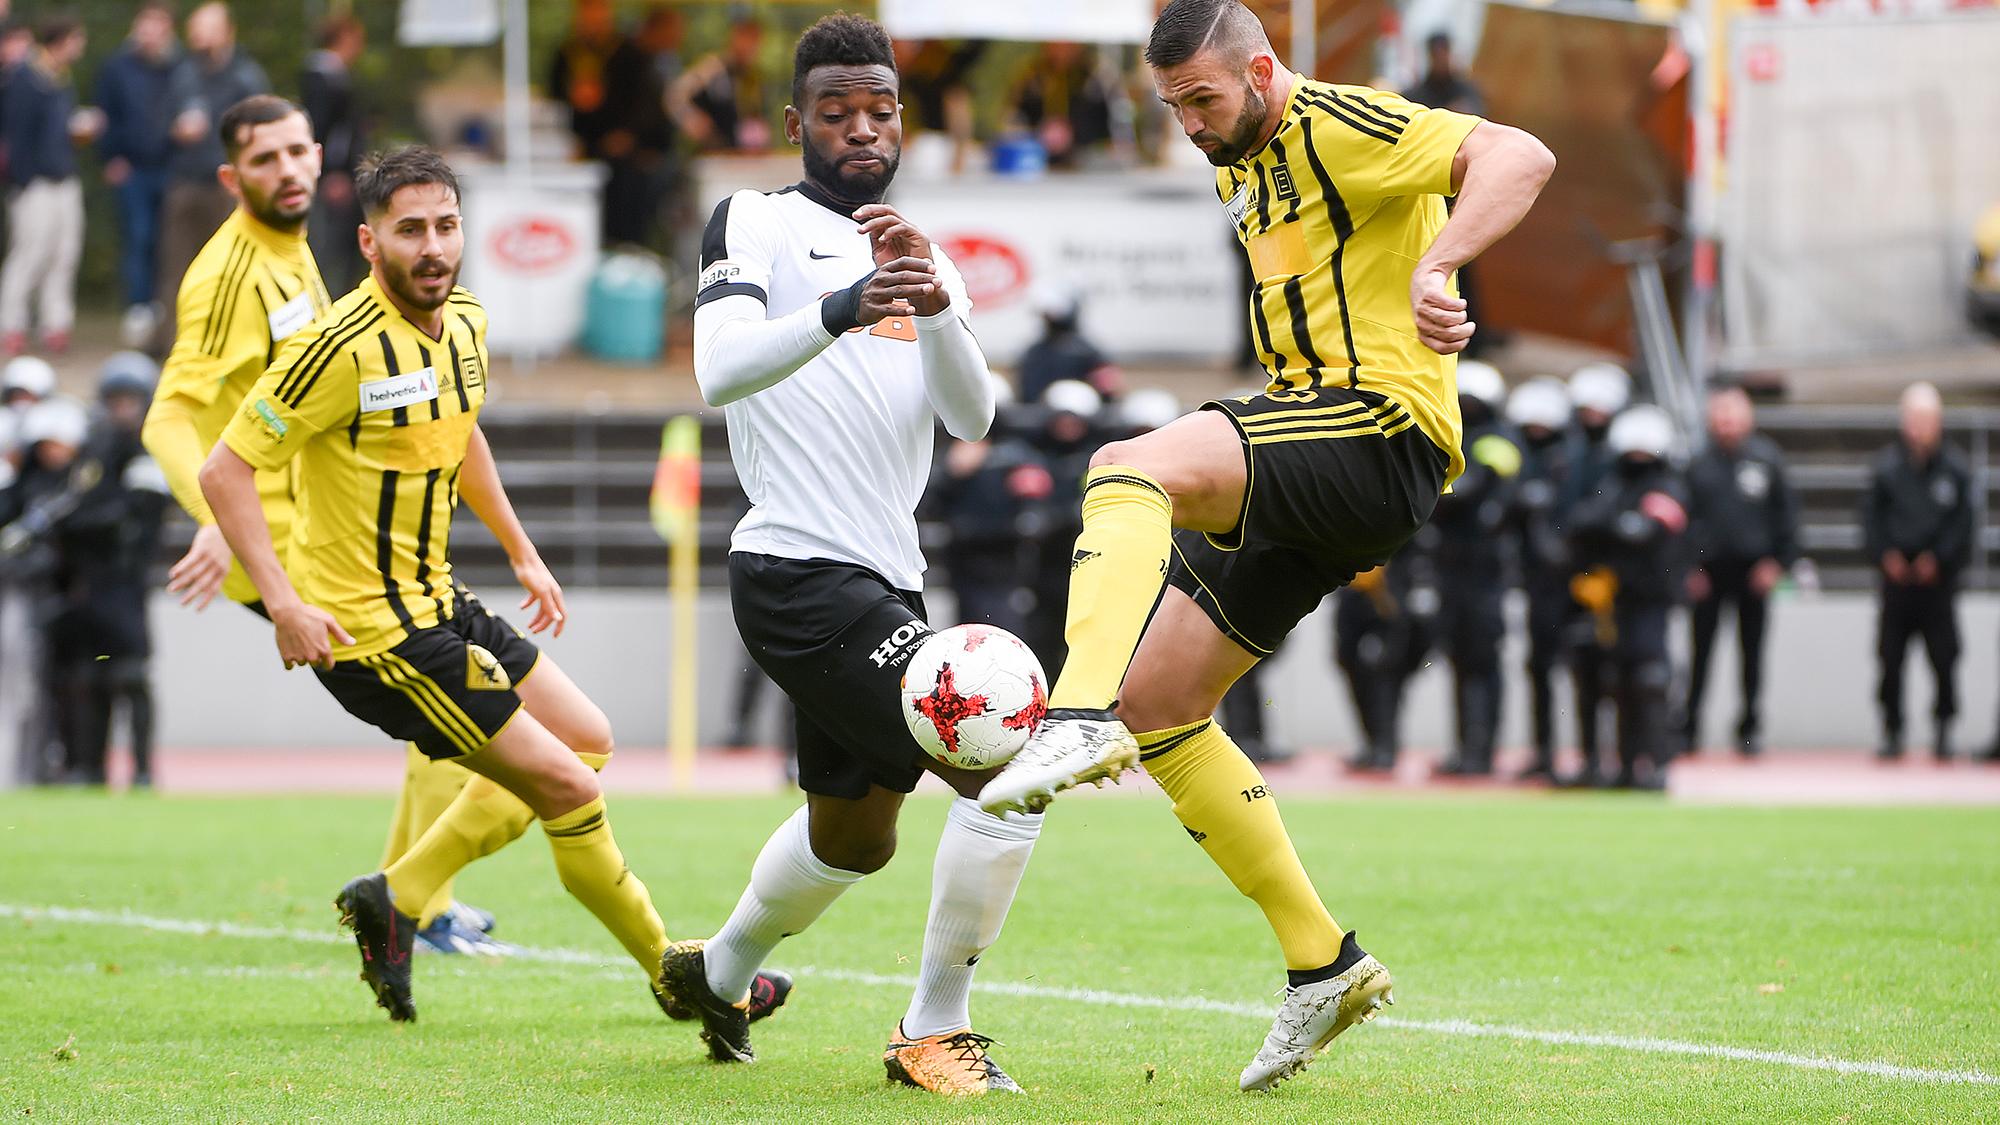 17.09.2017; Basel; Fussball Schweizer Cup - BSC Old Boys Basel - BSC Young Boys; Old Boys Arianit Tasholli gegen Jean-Pierre